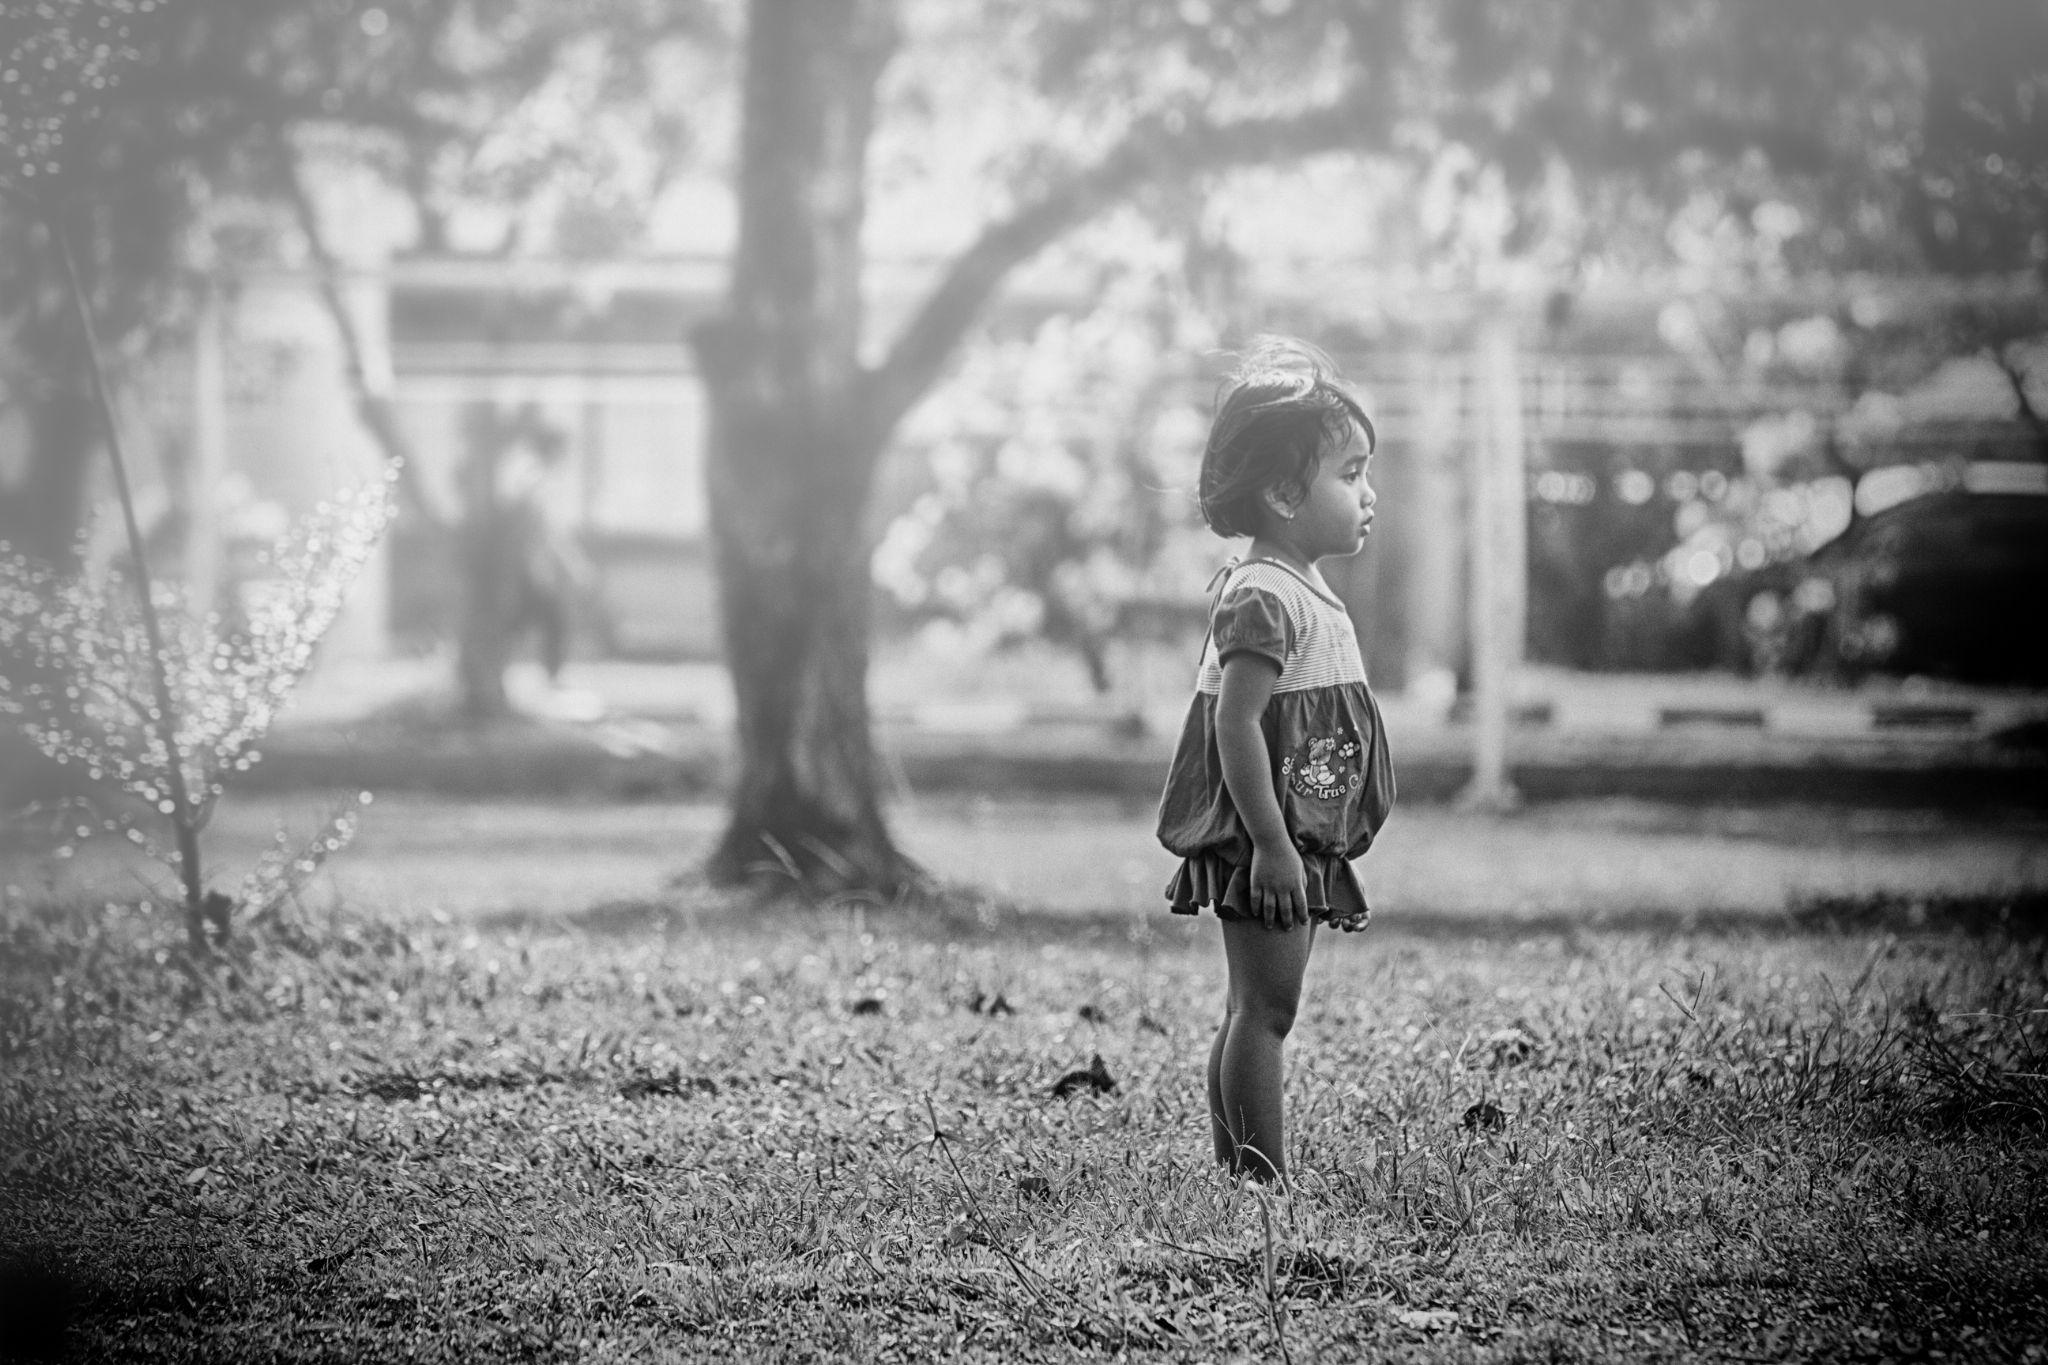 Alone by WAHYU